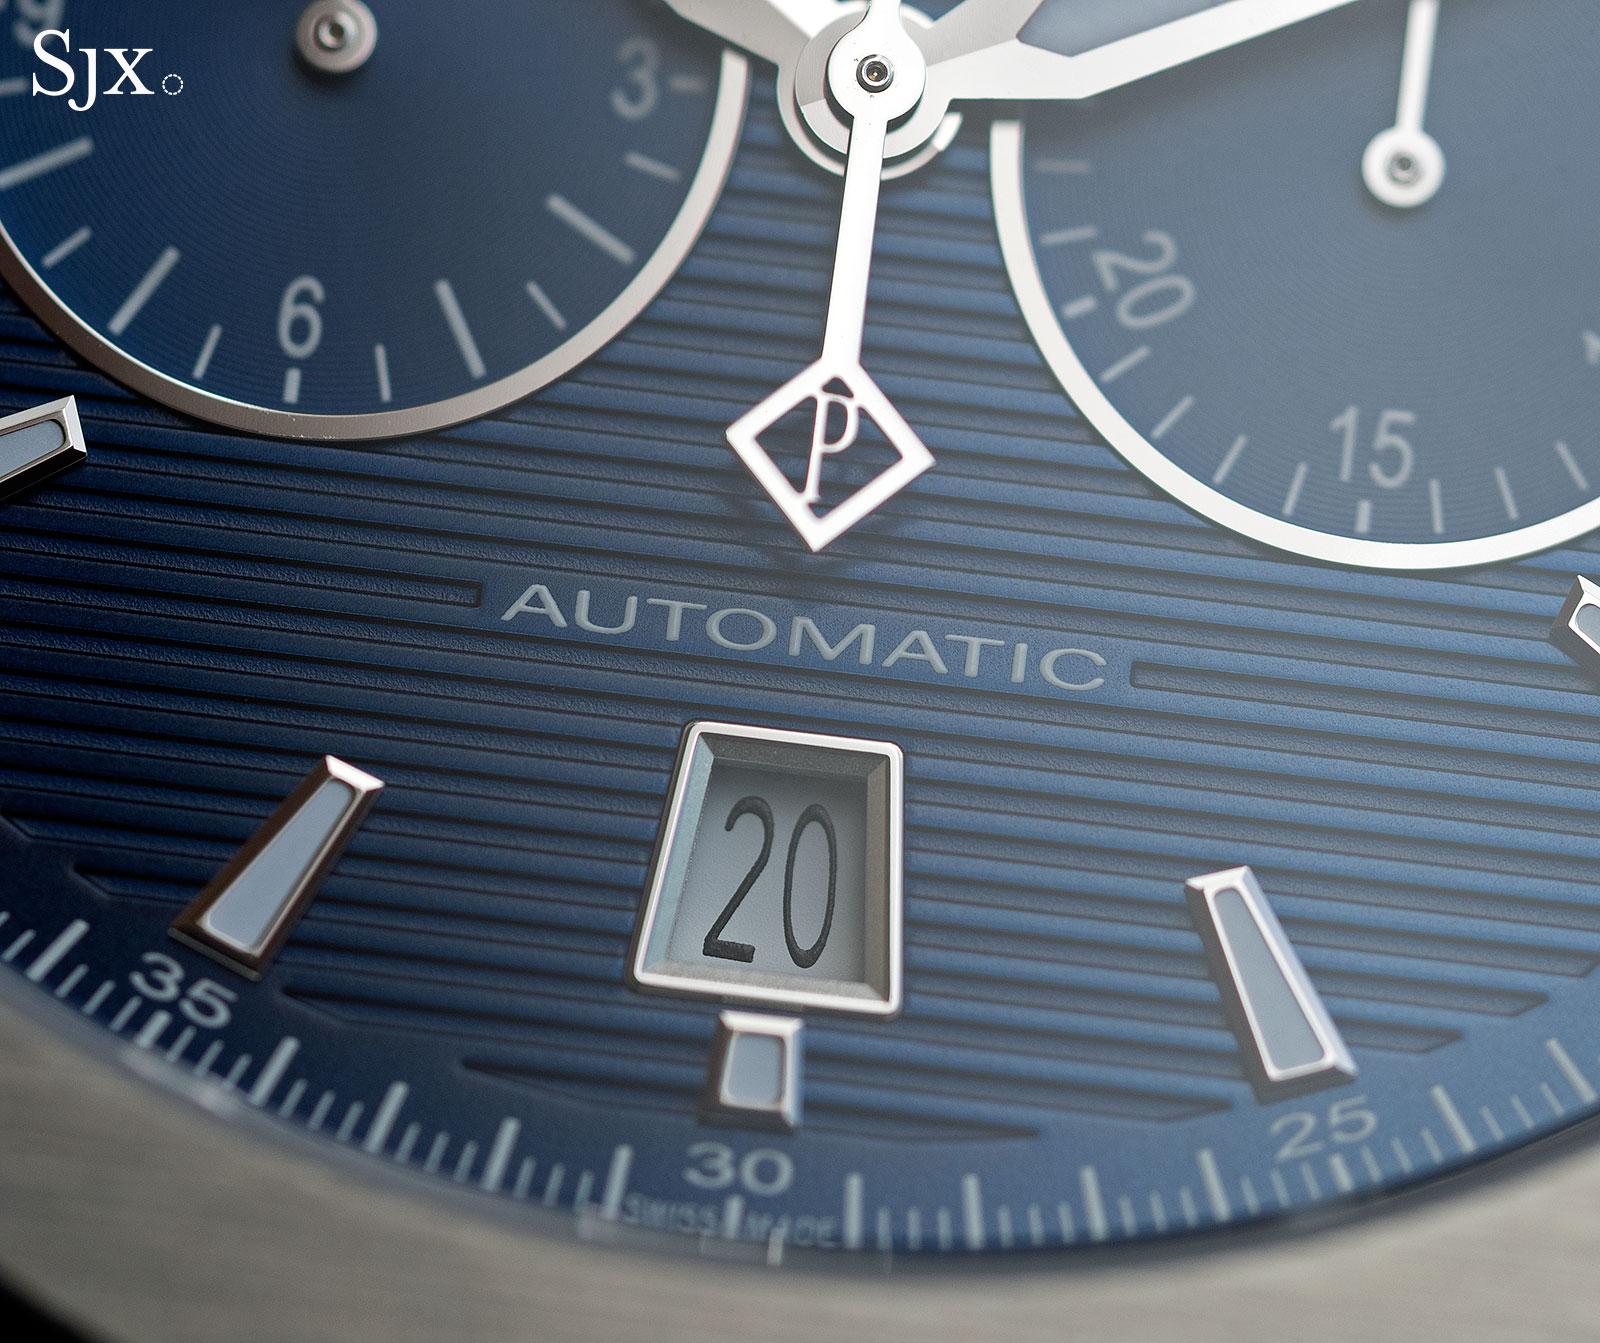 Piaget Polo S Chronograph 2